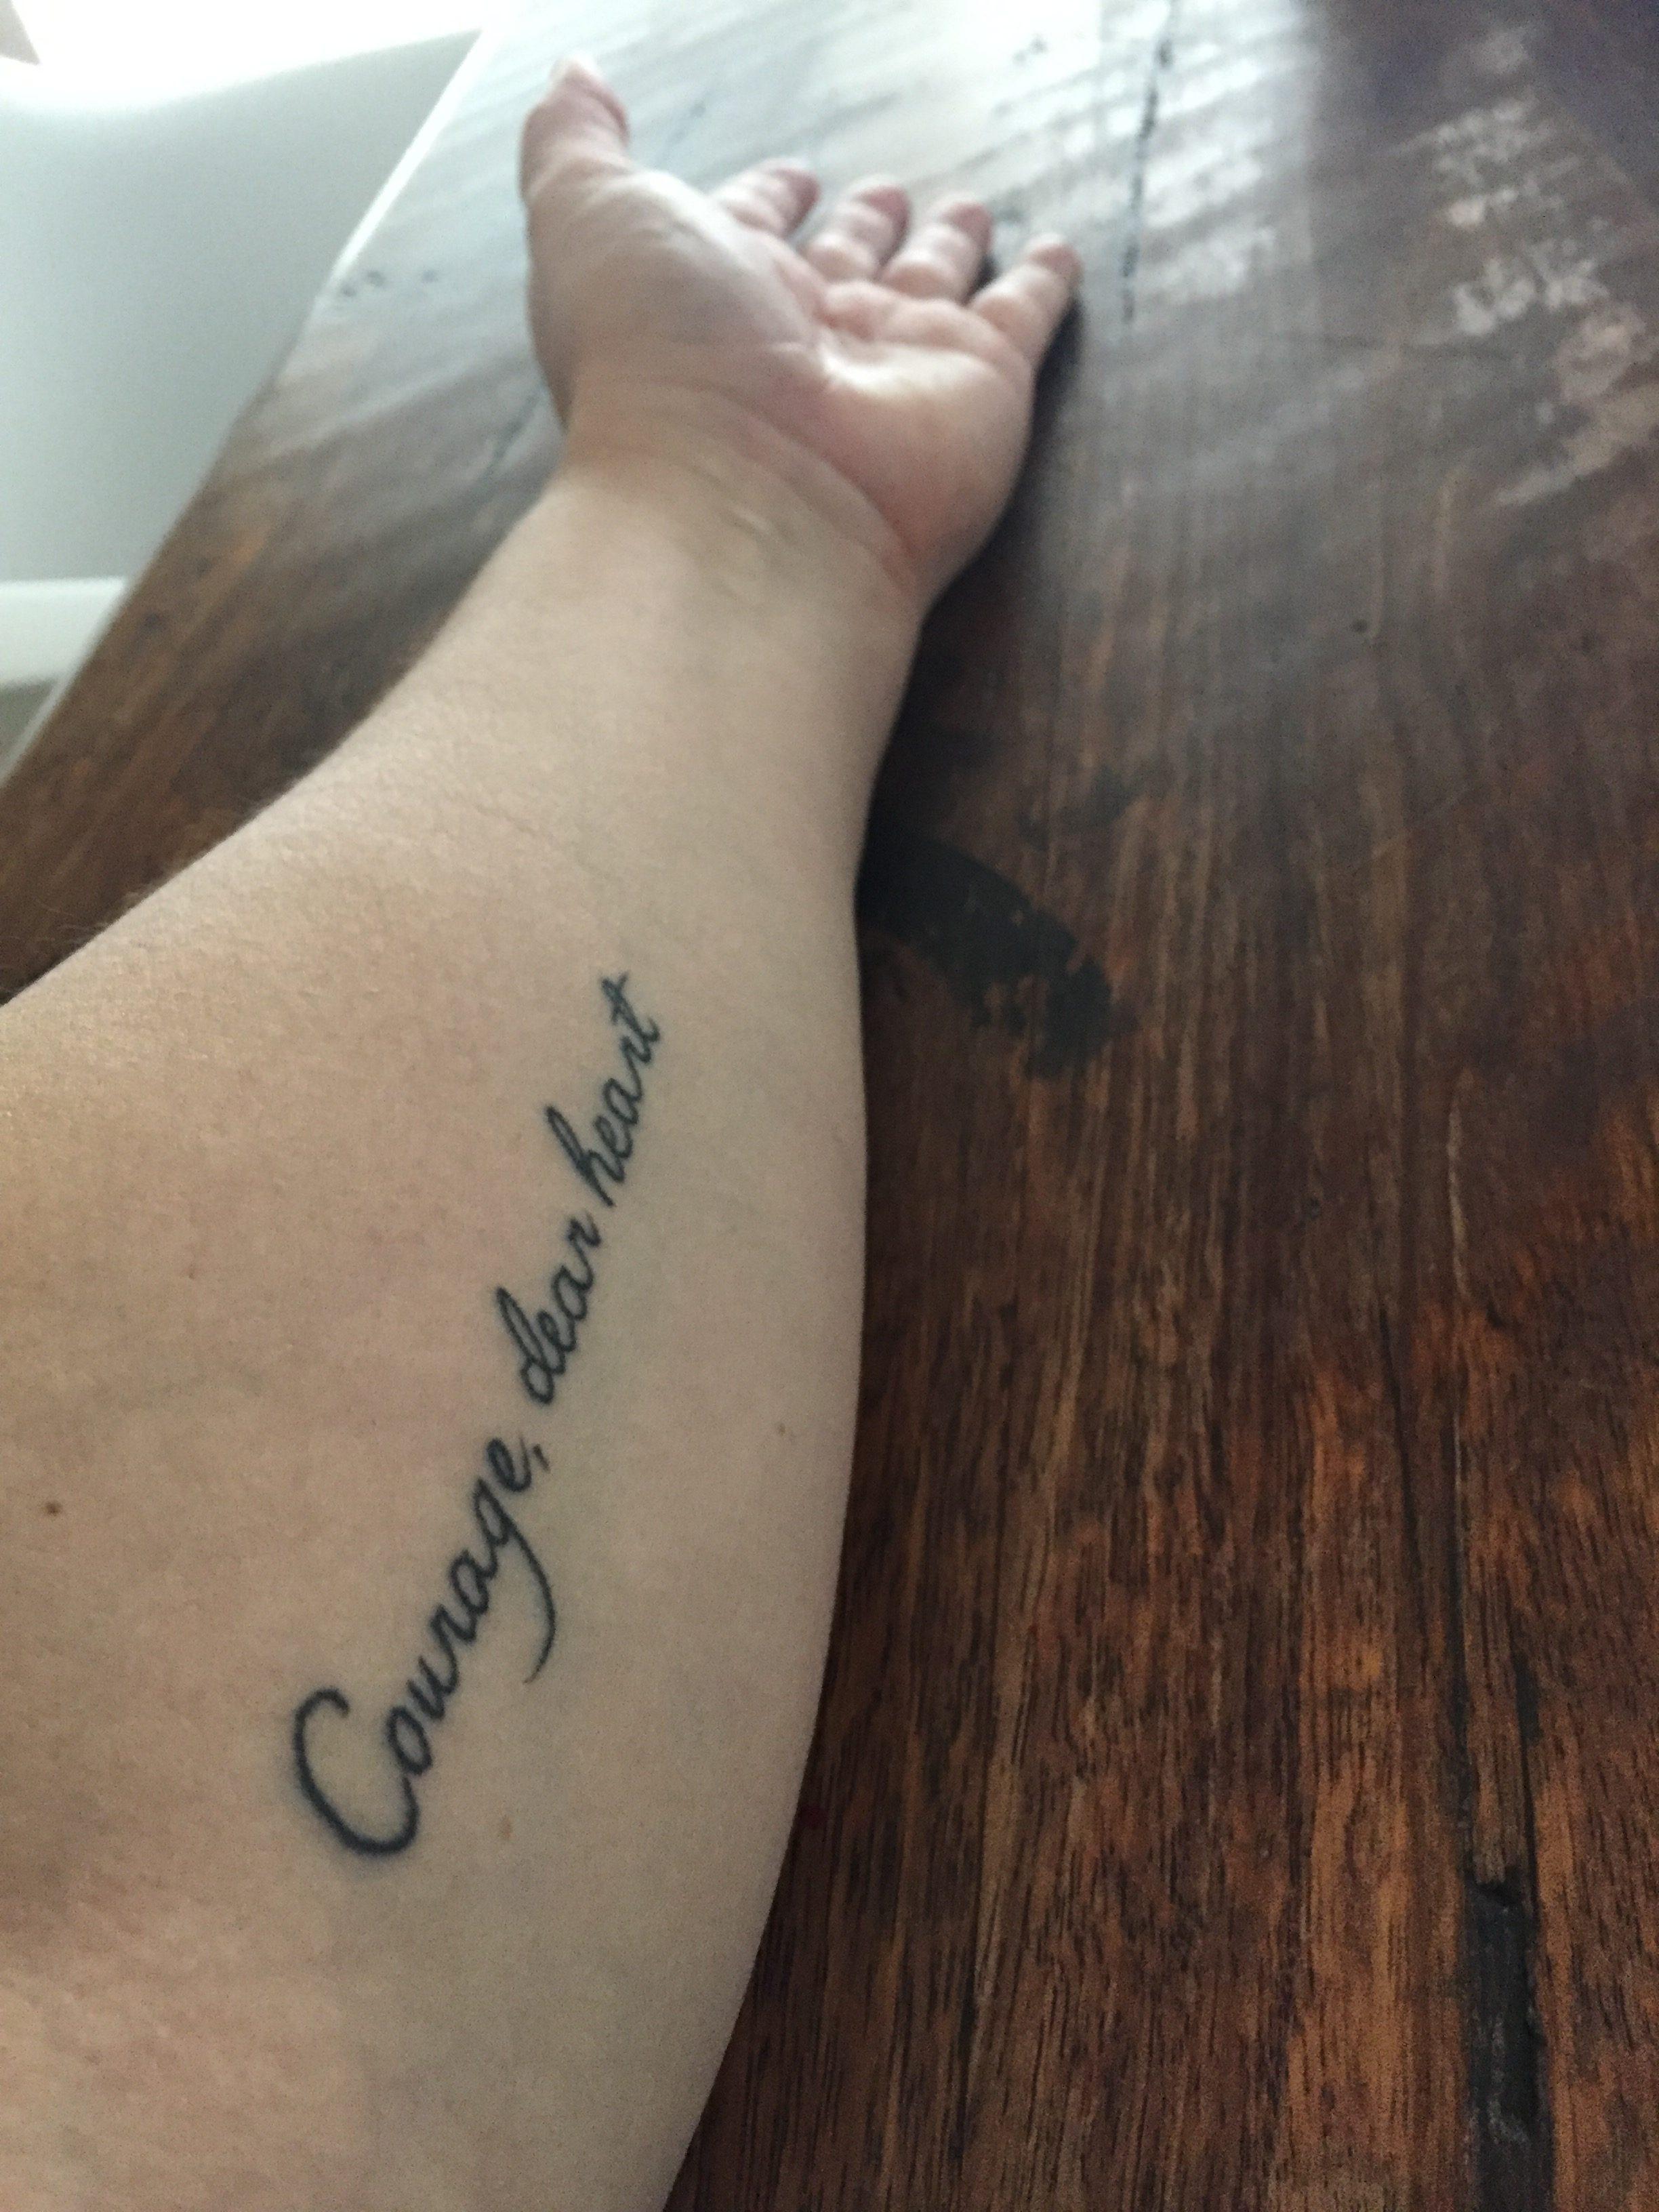 Courage, Dear Heart – Jane's Story